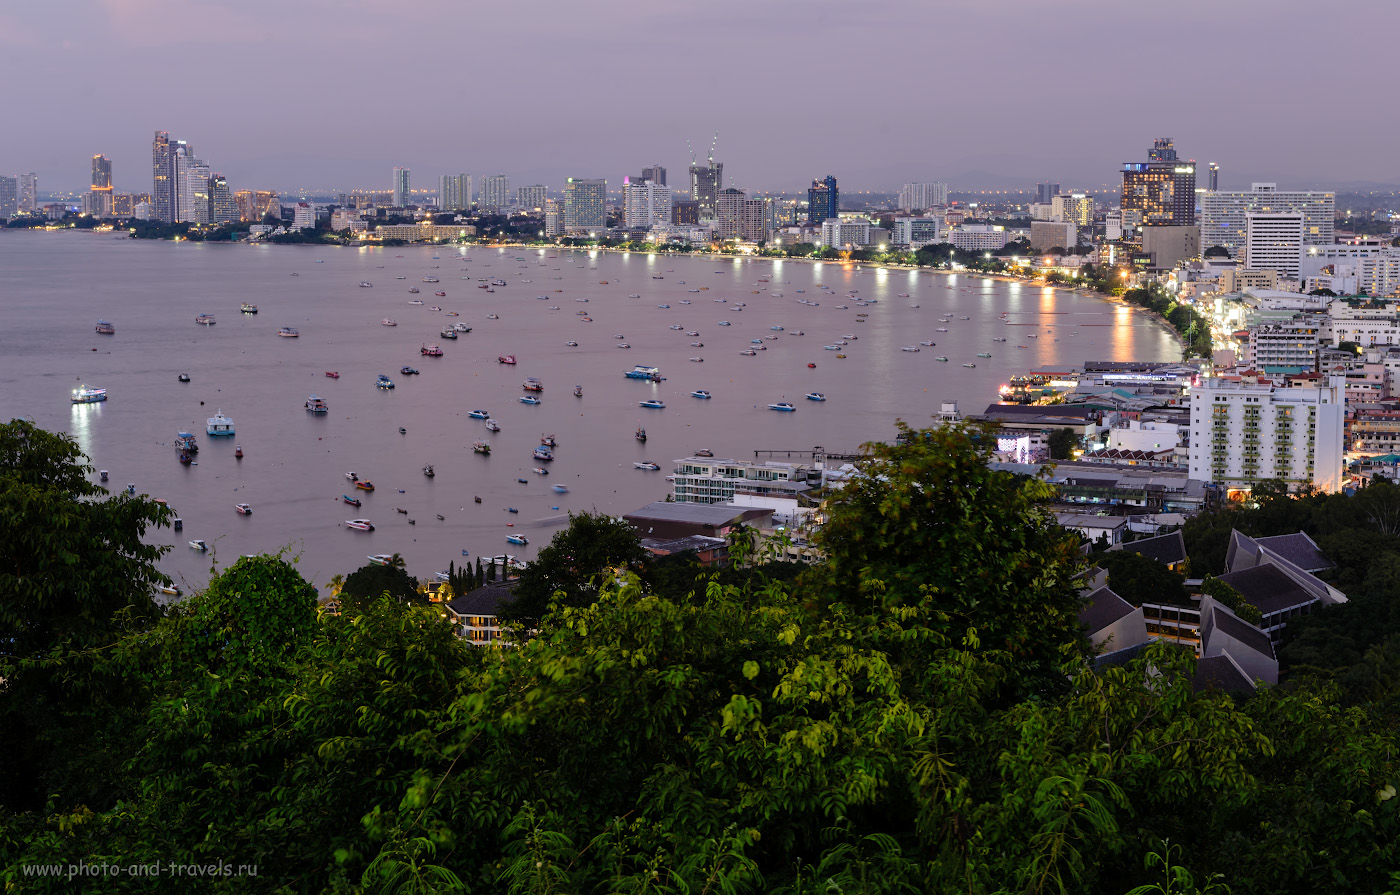 Фото 33. Вид на залив Паттайи со смотровой площадки на холме Pattaya Hill. Справа начинается знаменитая «улица грехов» Уокинг-Стрит (Walking Street). Отзывы о недорогих экскурсиях в Таиланде. Чем заняться вечерами. Снято на Nikon D610 + Nikon 24-70mm f/2.8G со штатива Sirui T-2204X. Параметры съемки: 6 сек., 9.0, 100, 56.